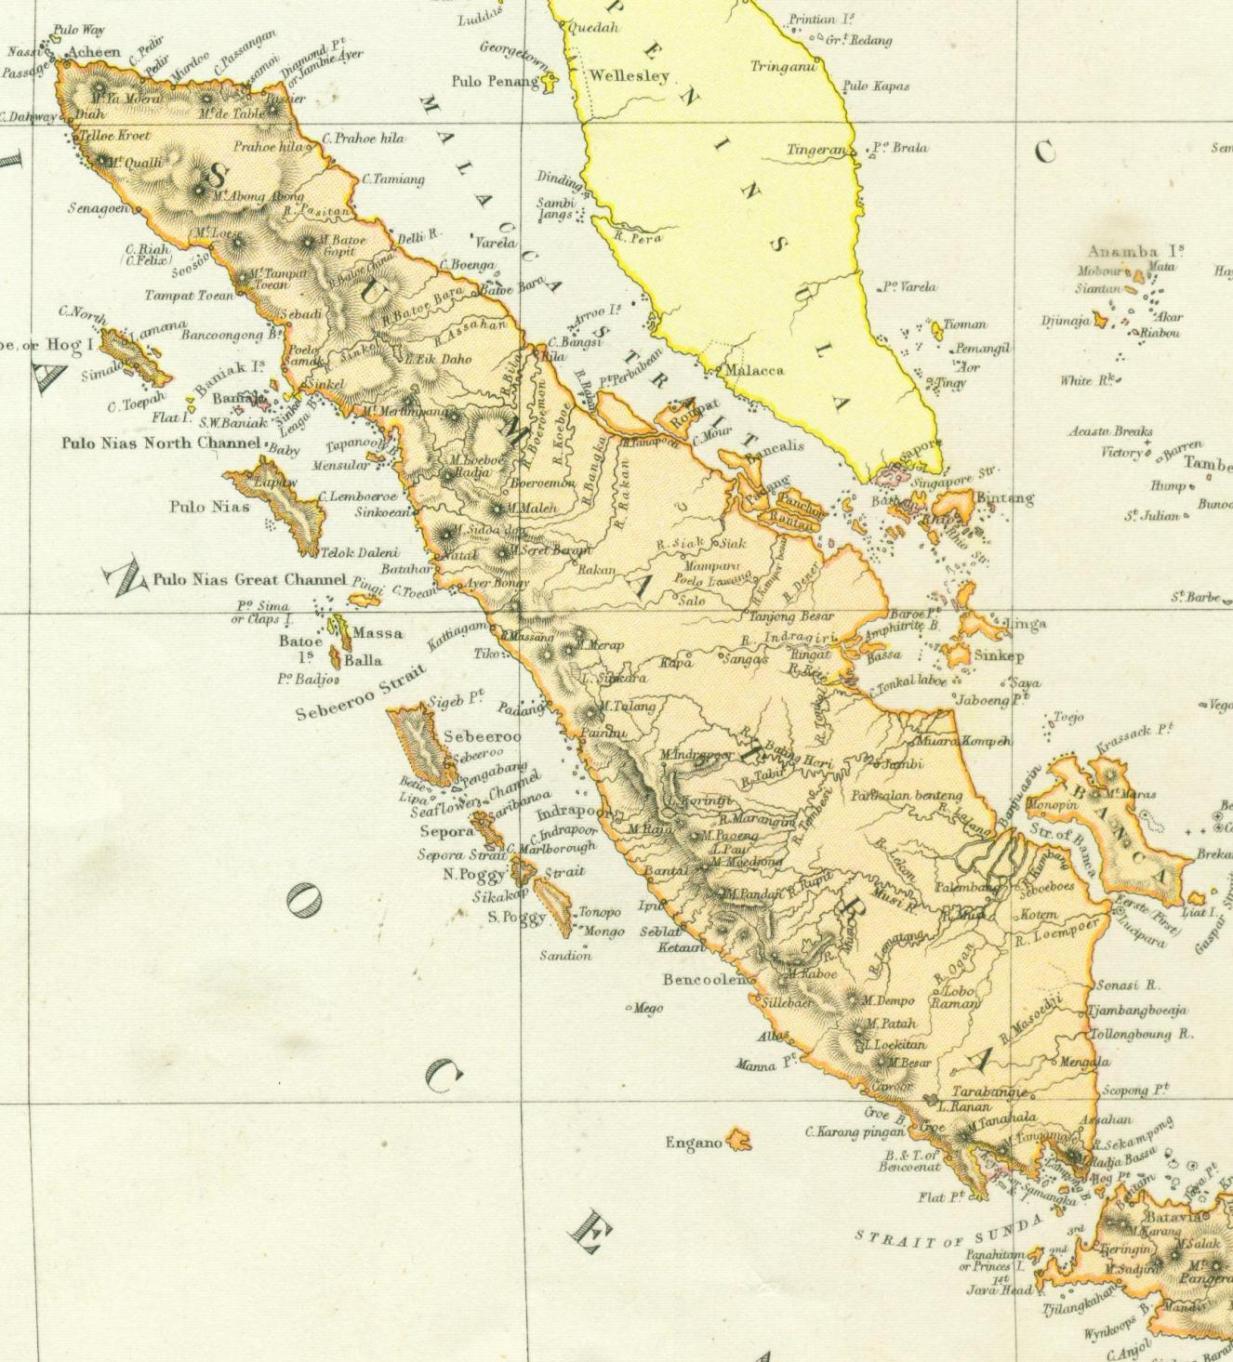 http://2.bp.blogspot.com/-pF8DZoQBC8E/T_f_1Fk5H2I/AAAAAAAAGDE/hGXLum0ZnmM/s1600/z++08+Jun.+12+-+Peta+kuno+Indonesia+th.1859+-+03.jpg